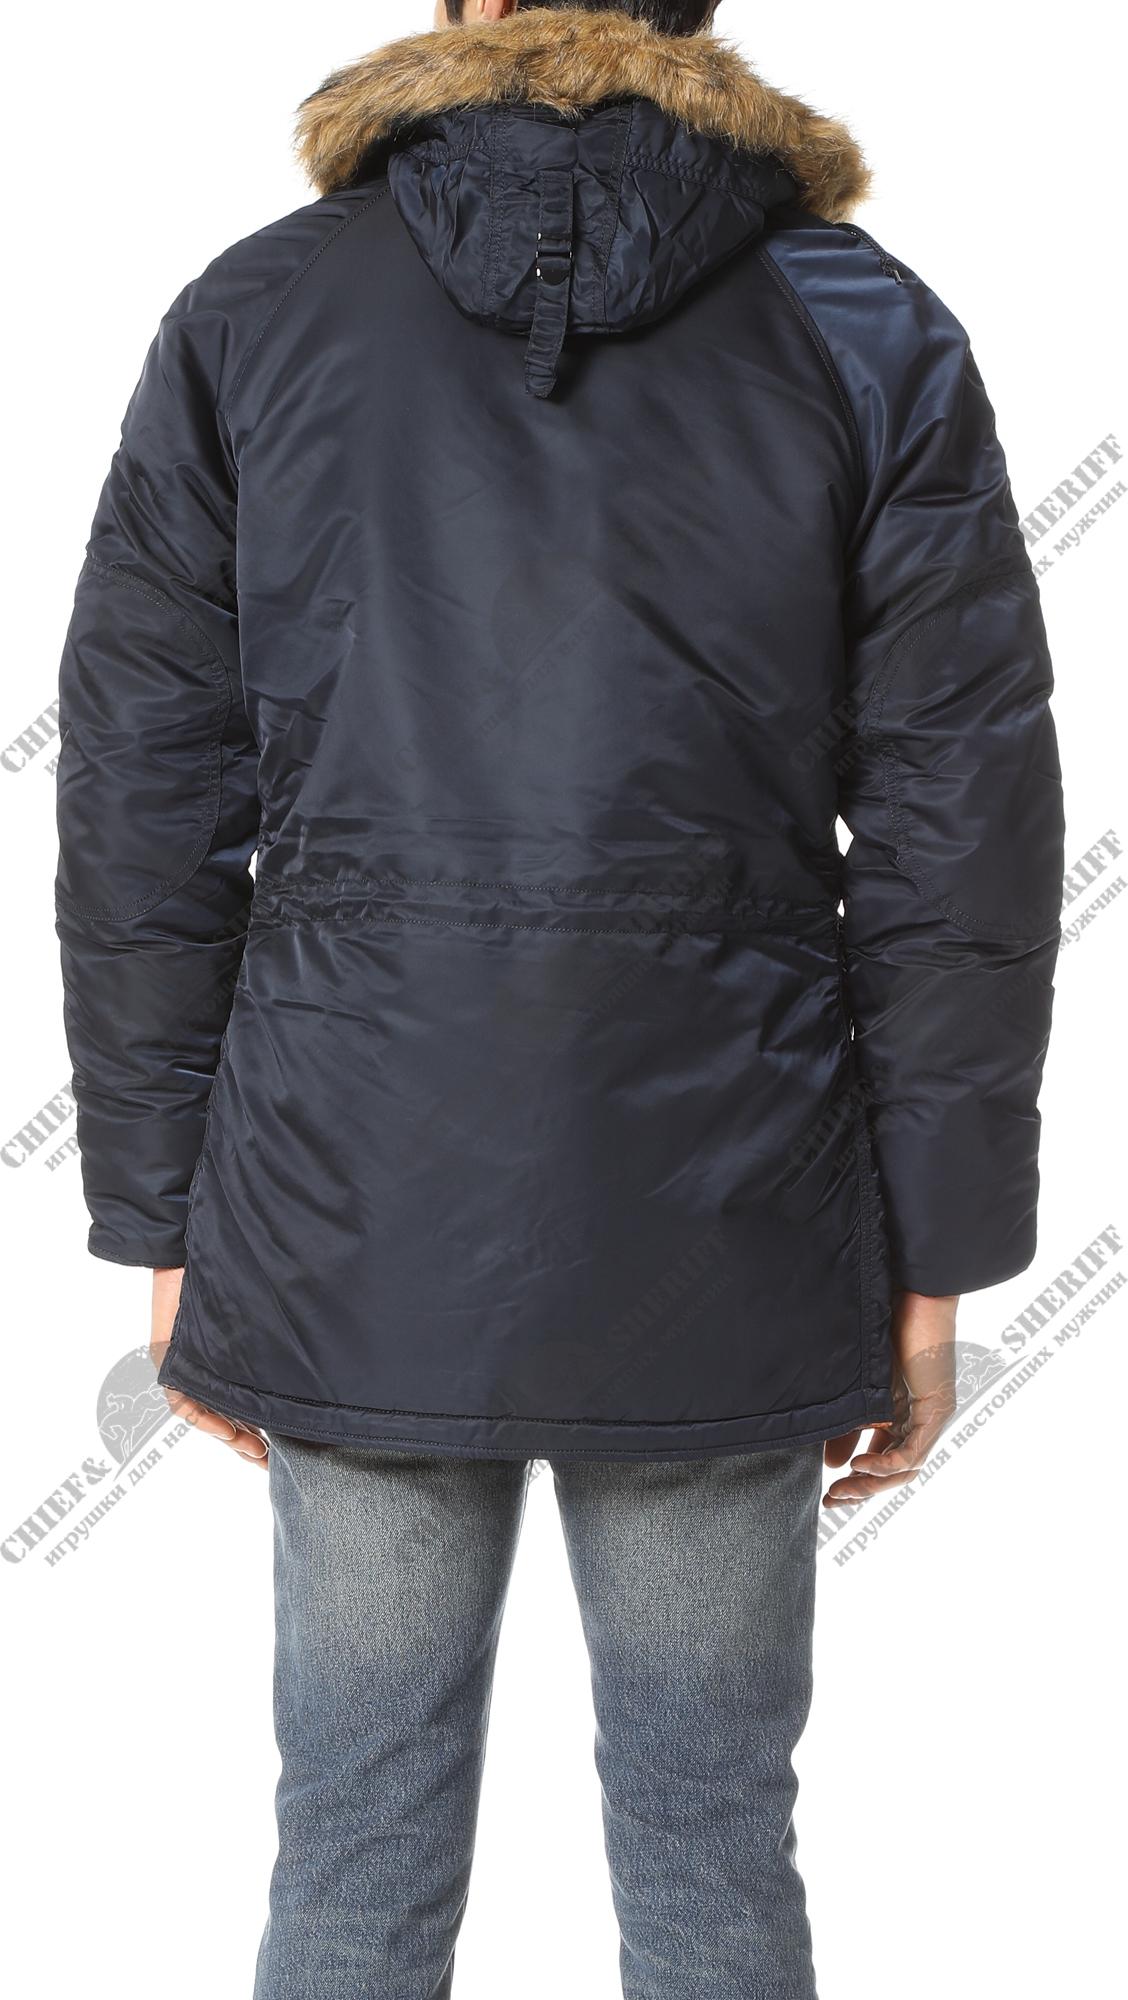 3844d5a2 ... Куртка аляска Alpha Industries slim Fit N-3B, Parka, blue-orange ...